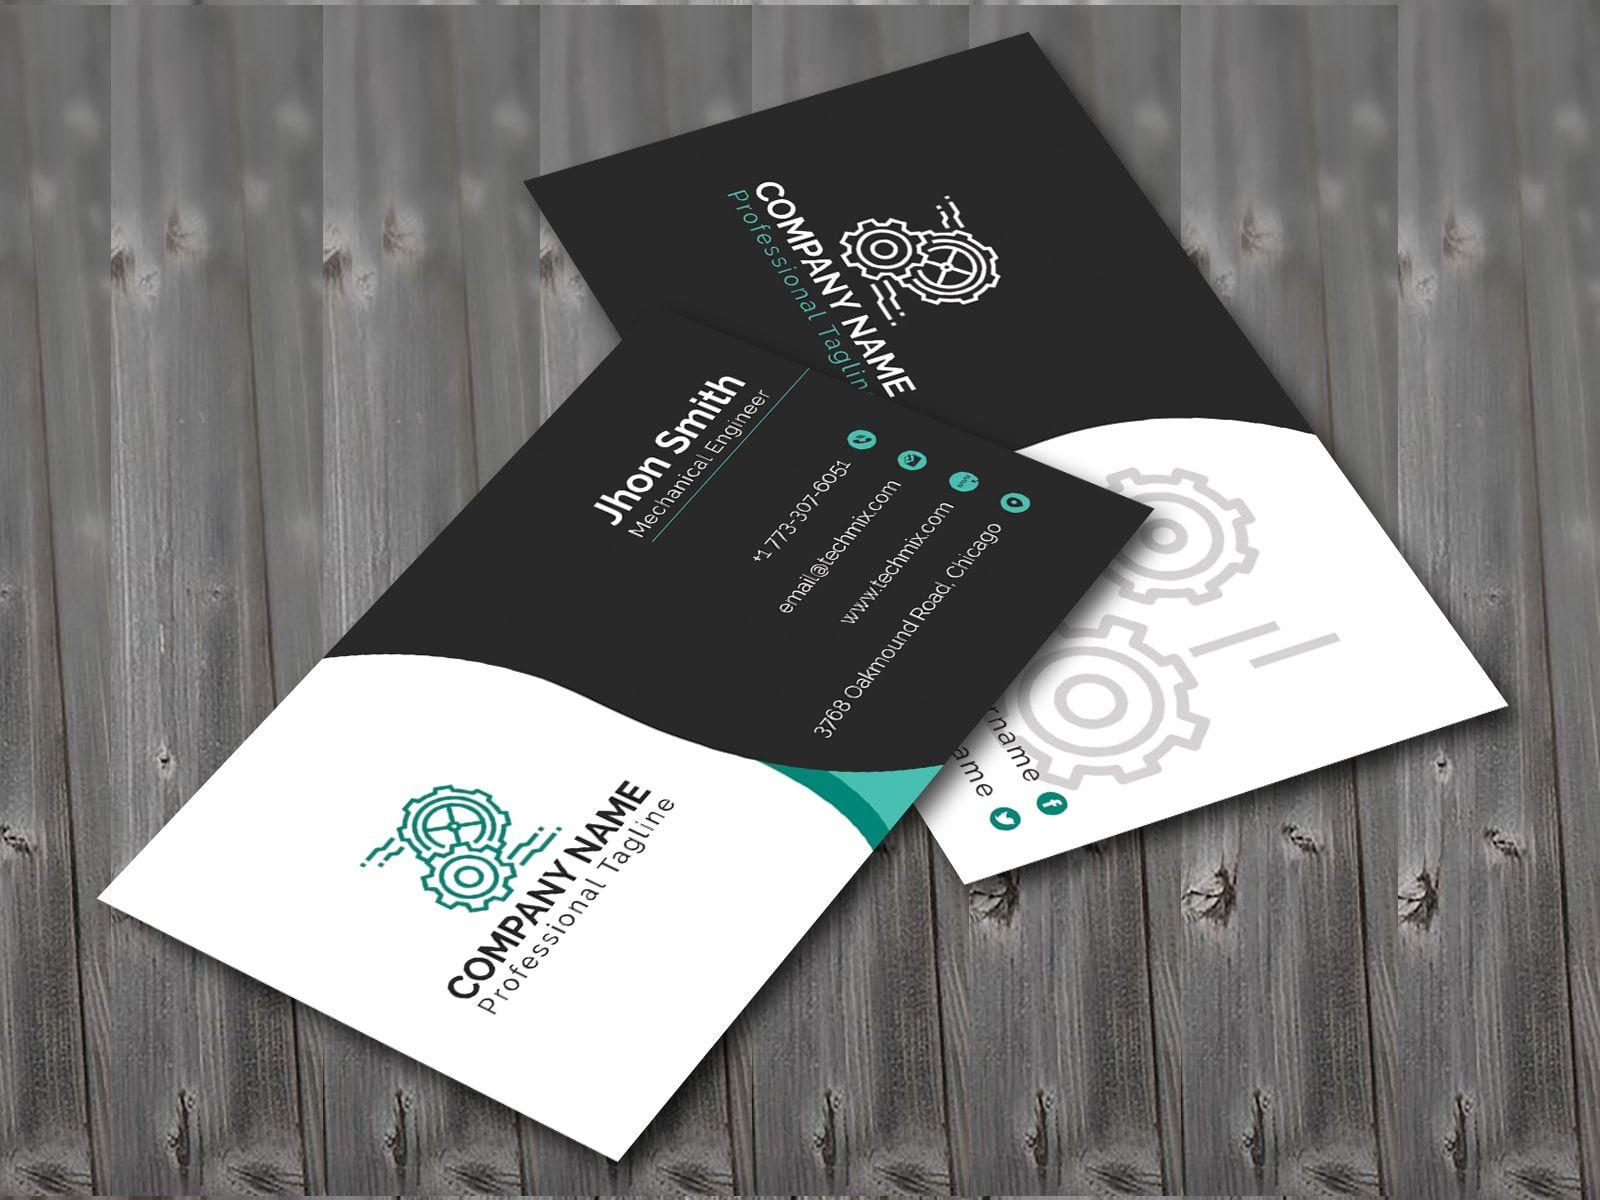 Black White Mechanical Engineer Business Card Business Cards Collection Business Card Design Creative Mechanical Engineering